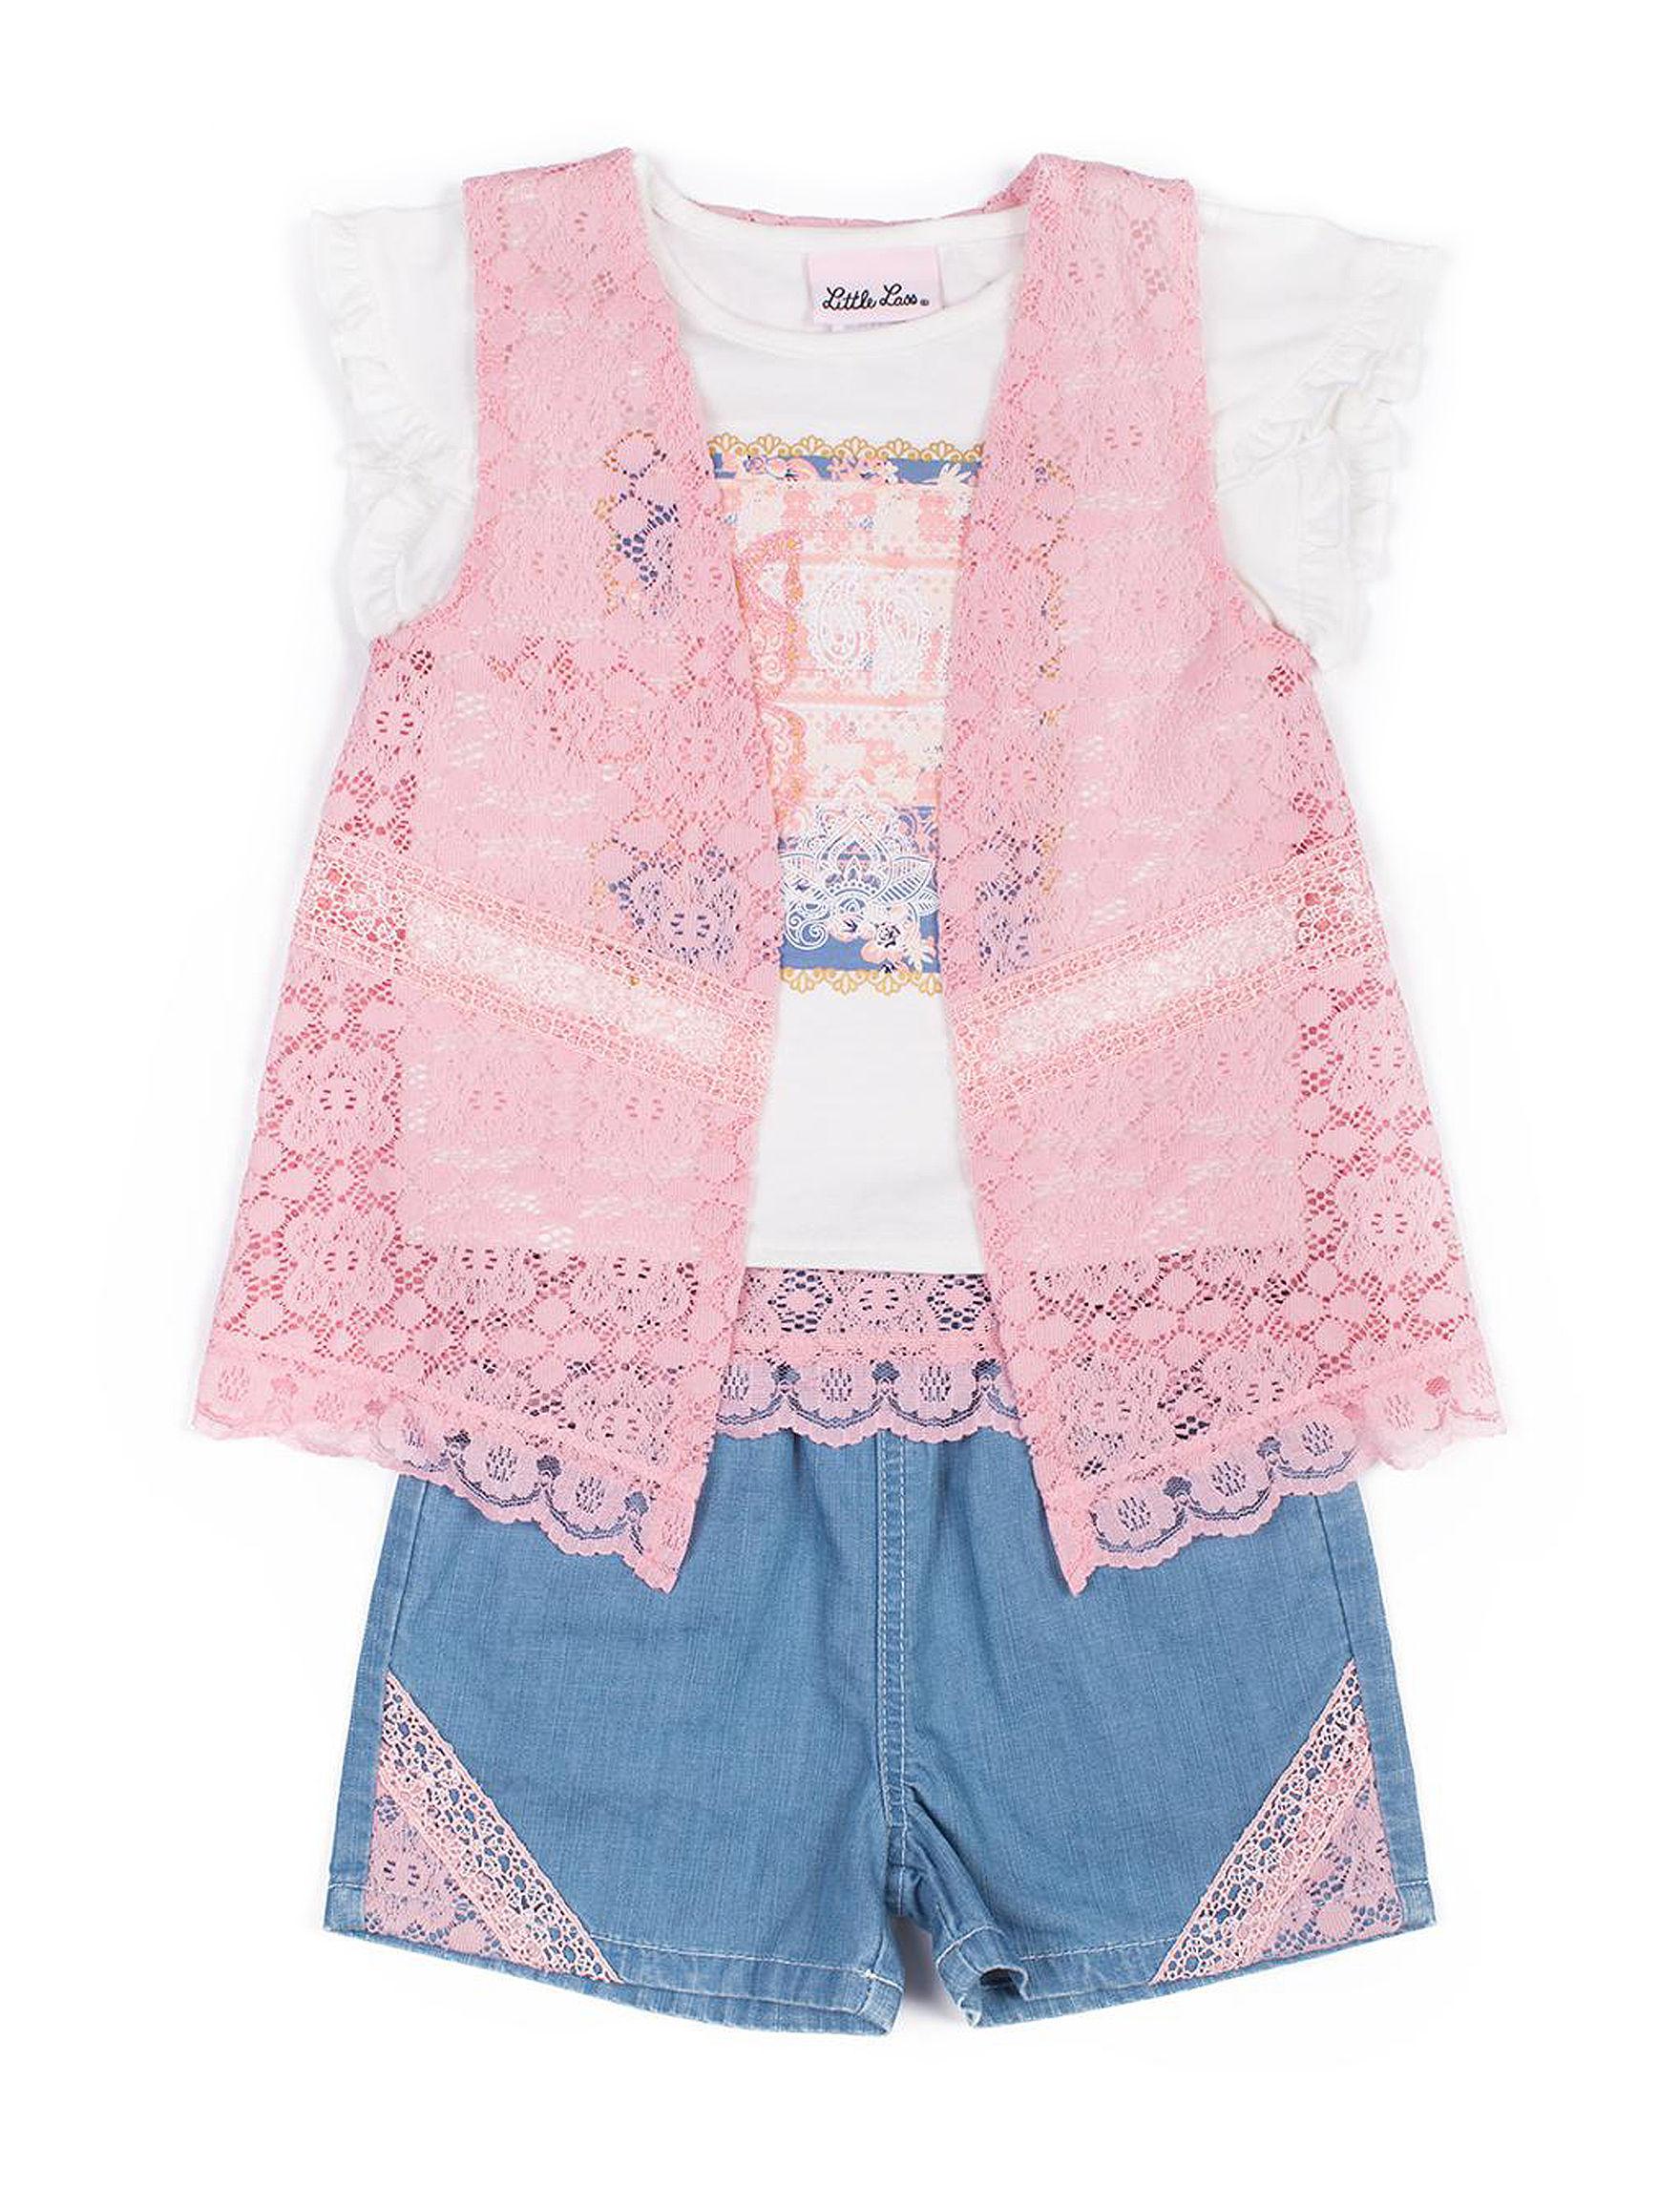 Little Lass Pink / White